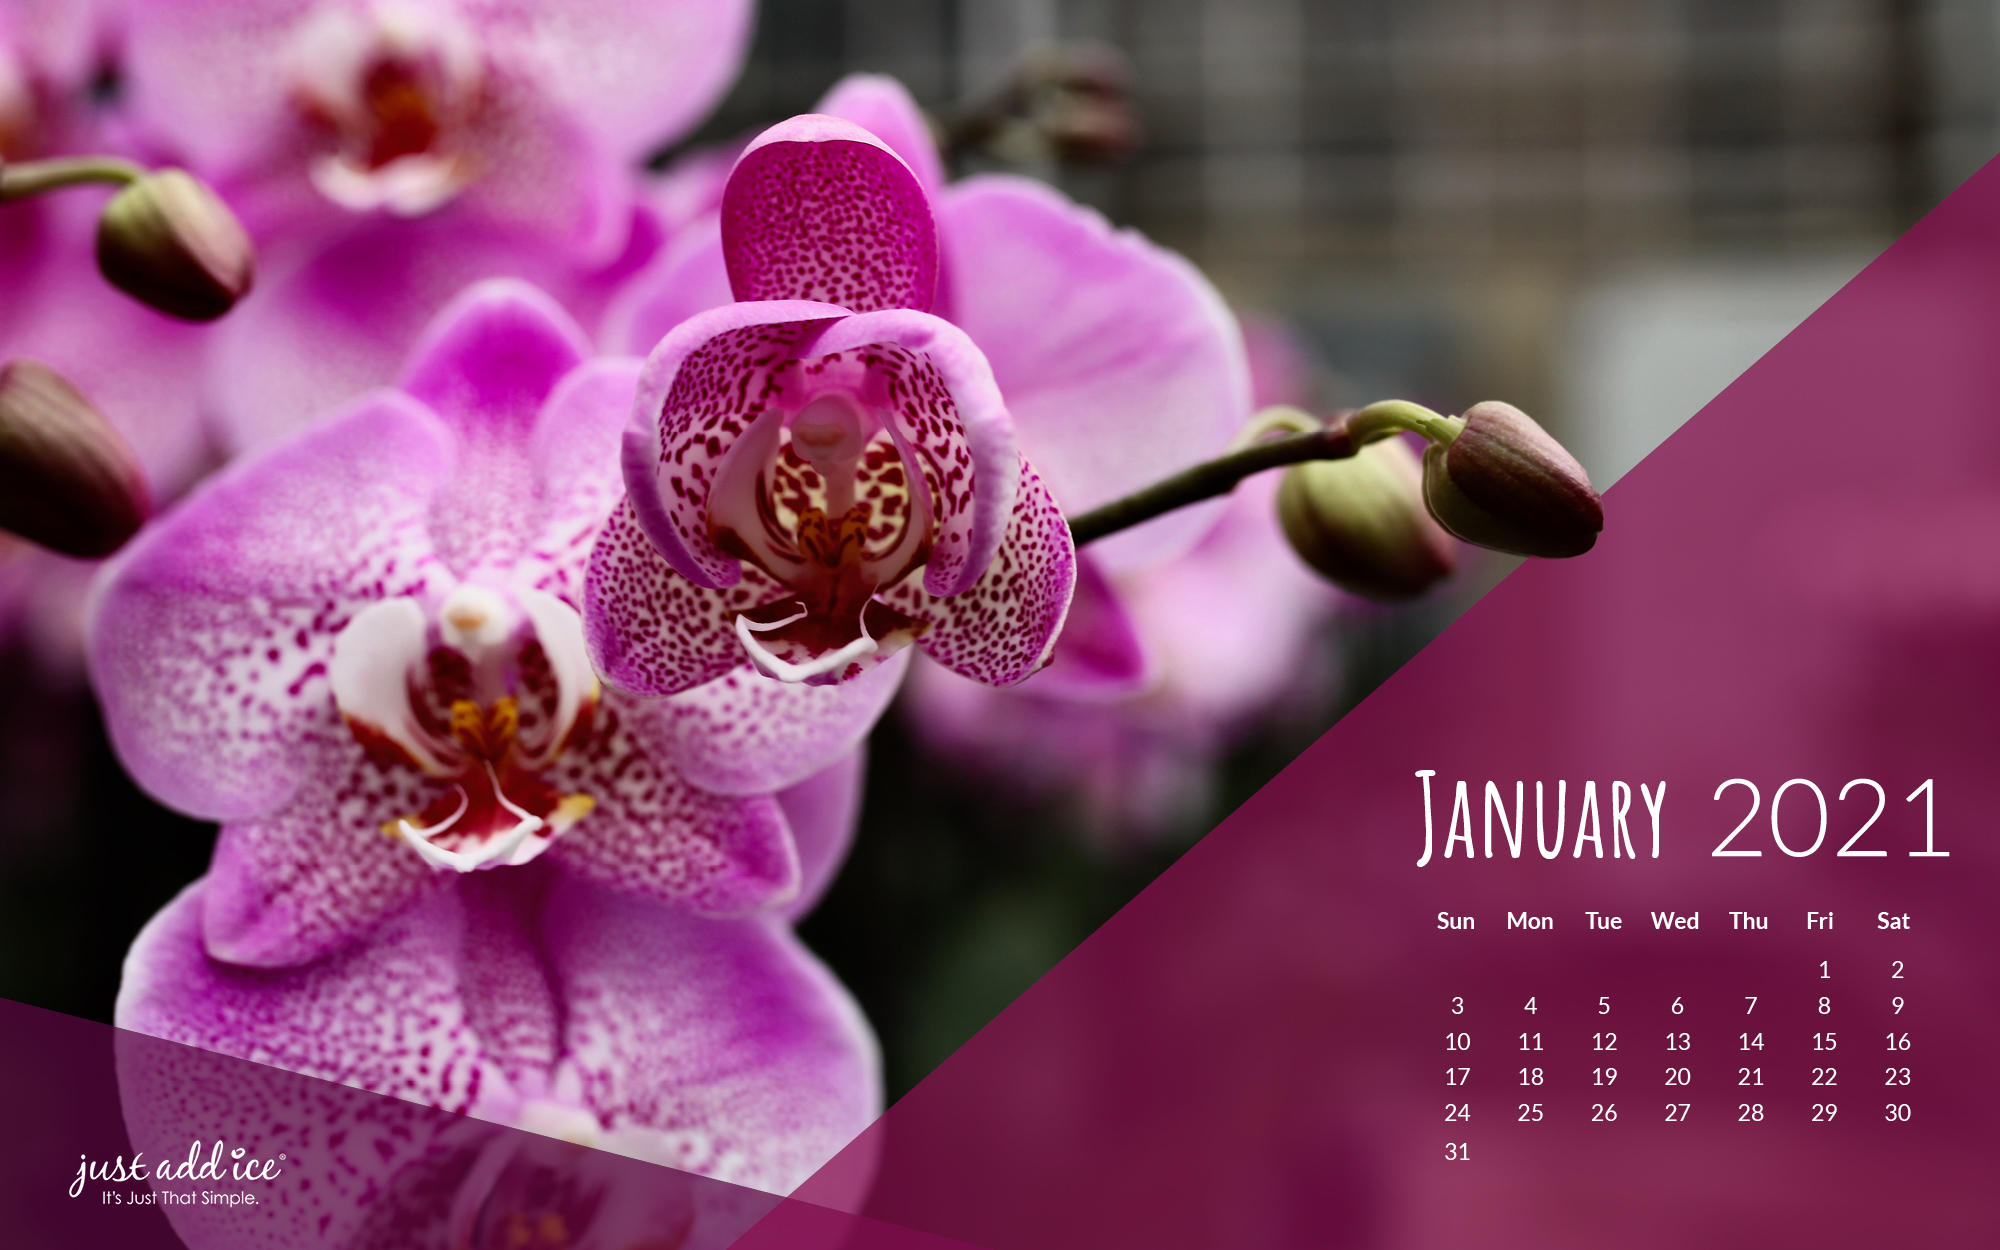 January 2021 Watering Reminder